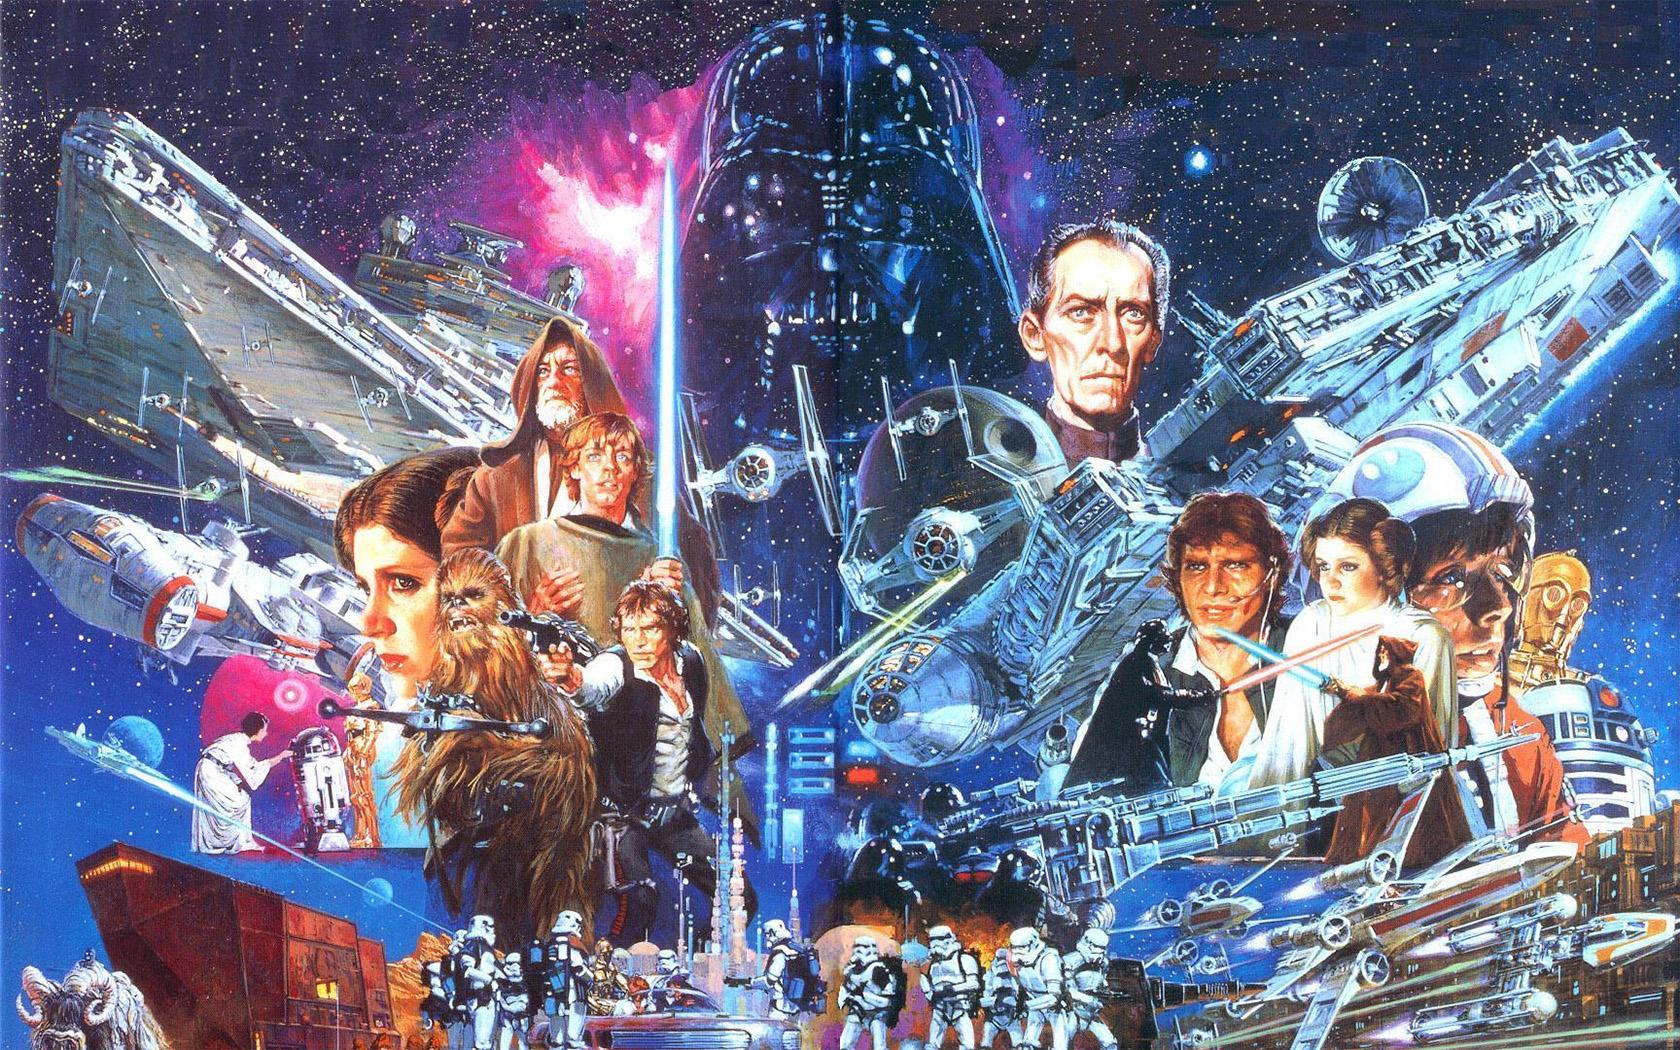 Classic Movie Star Wars Wallpaper Mega Wallpapers 1680x1050